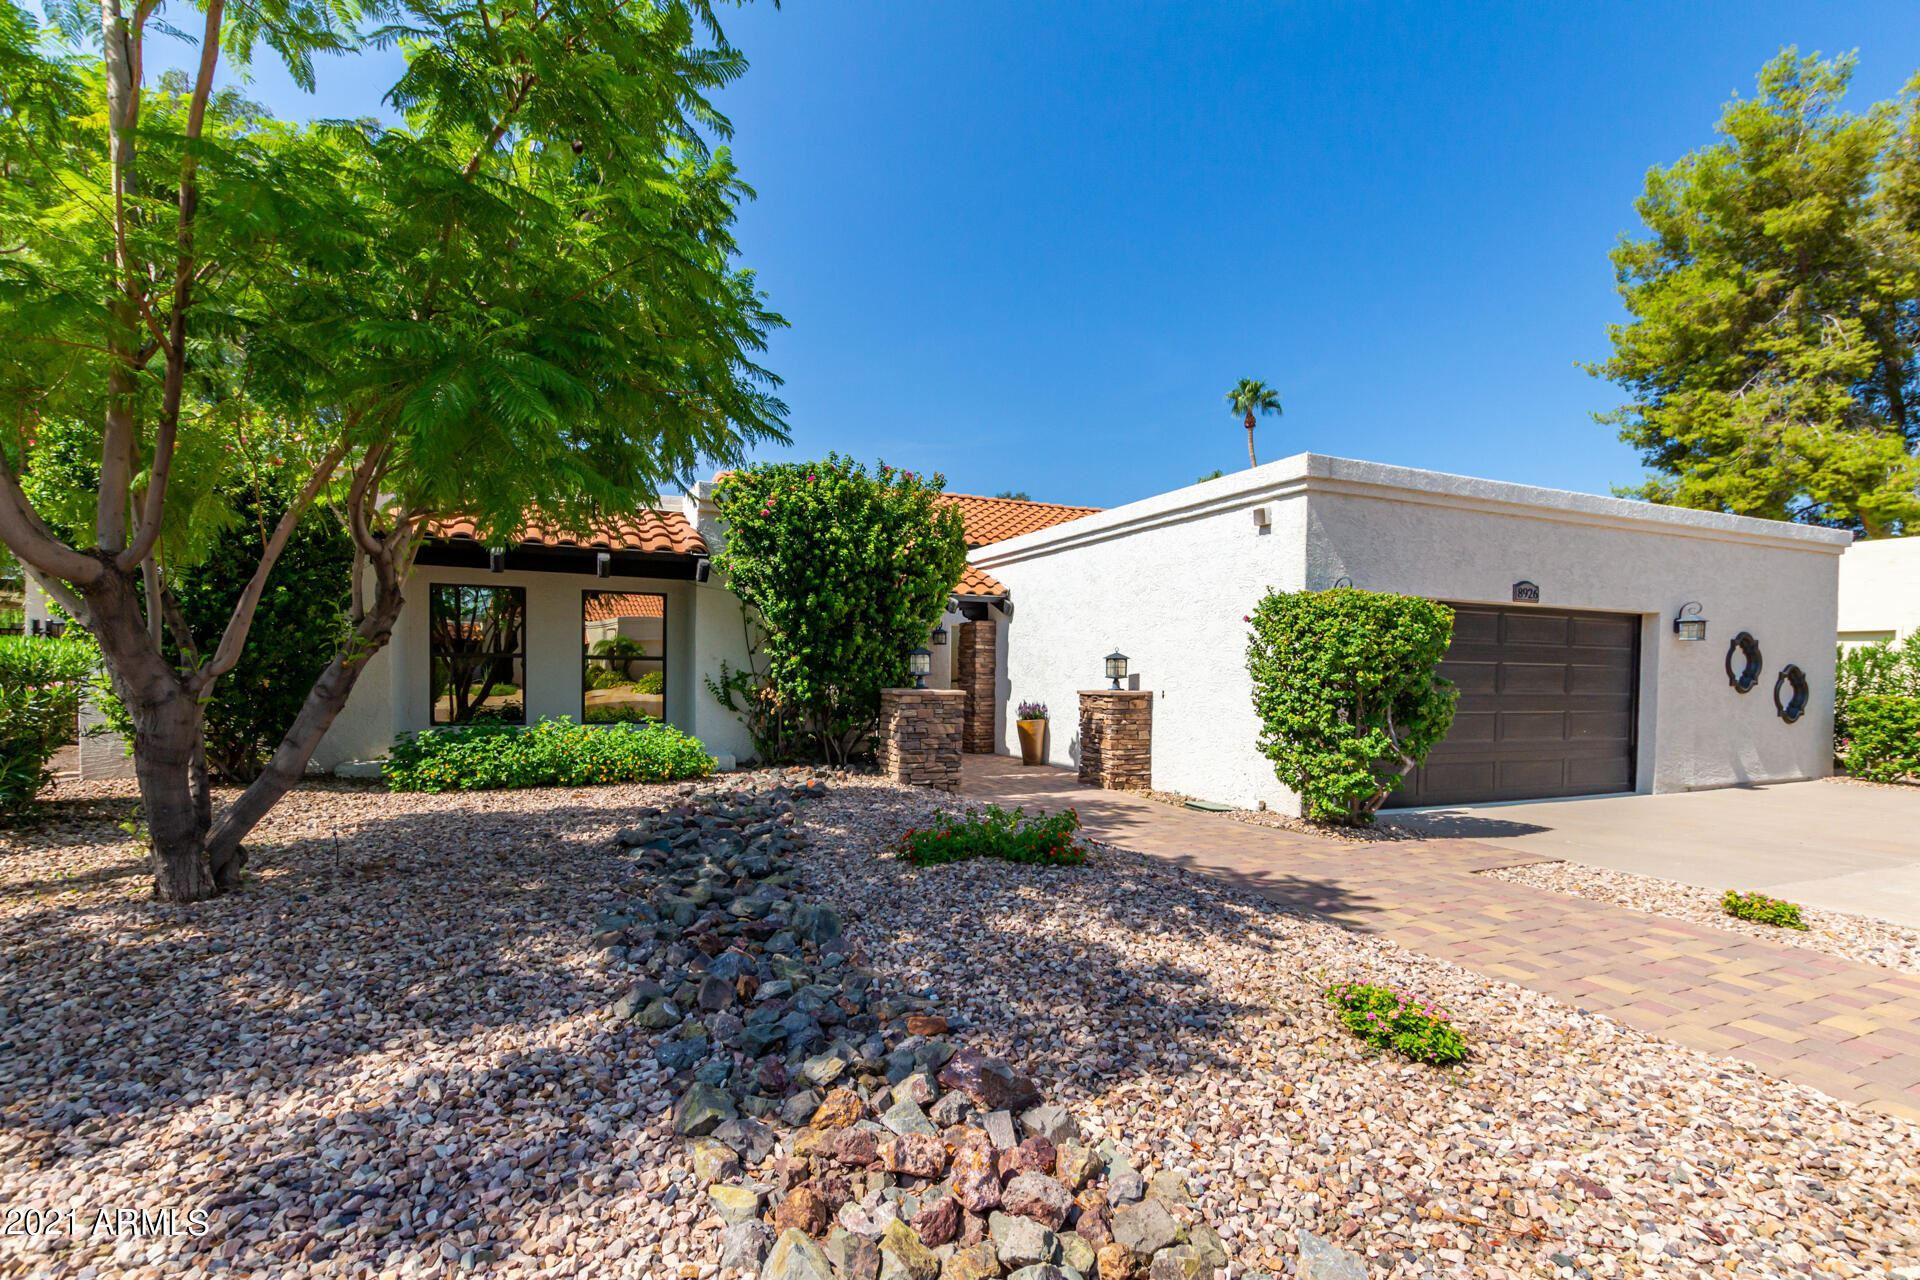 8926 N 87th Court, Scottsdale, AZ 85258 - MLS#: 6234644